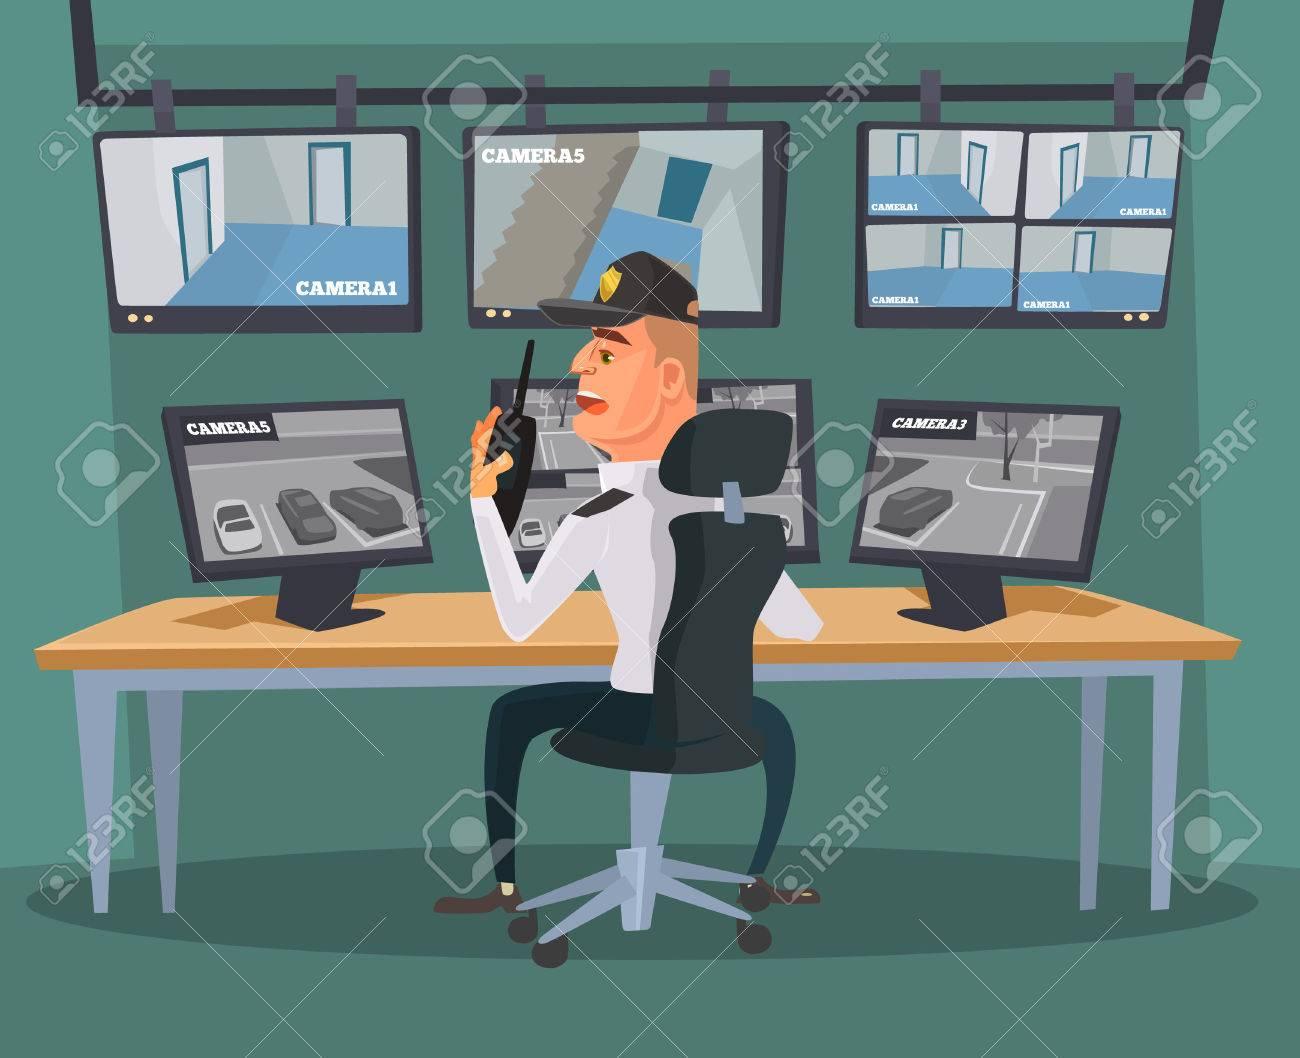 Security guard character watching cameras. Vector flat cartoon illustration - 71079319